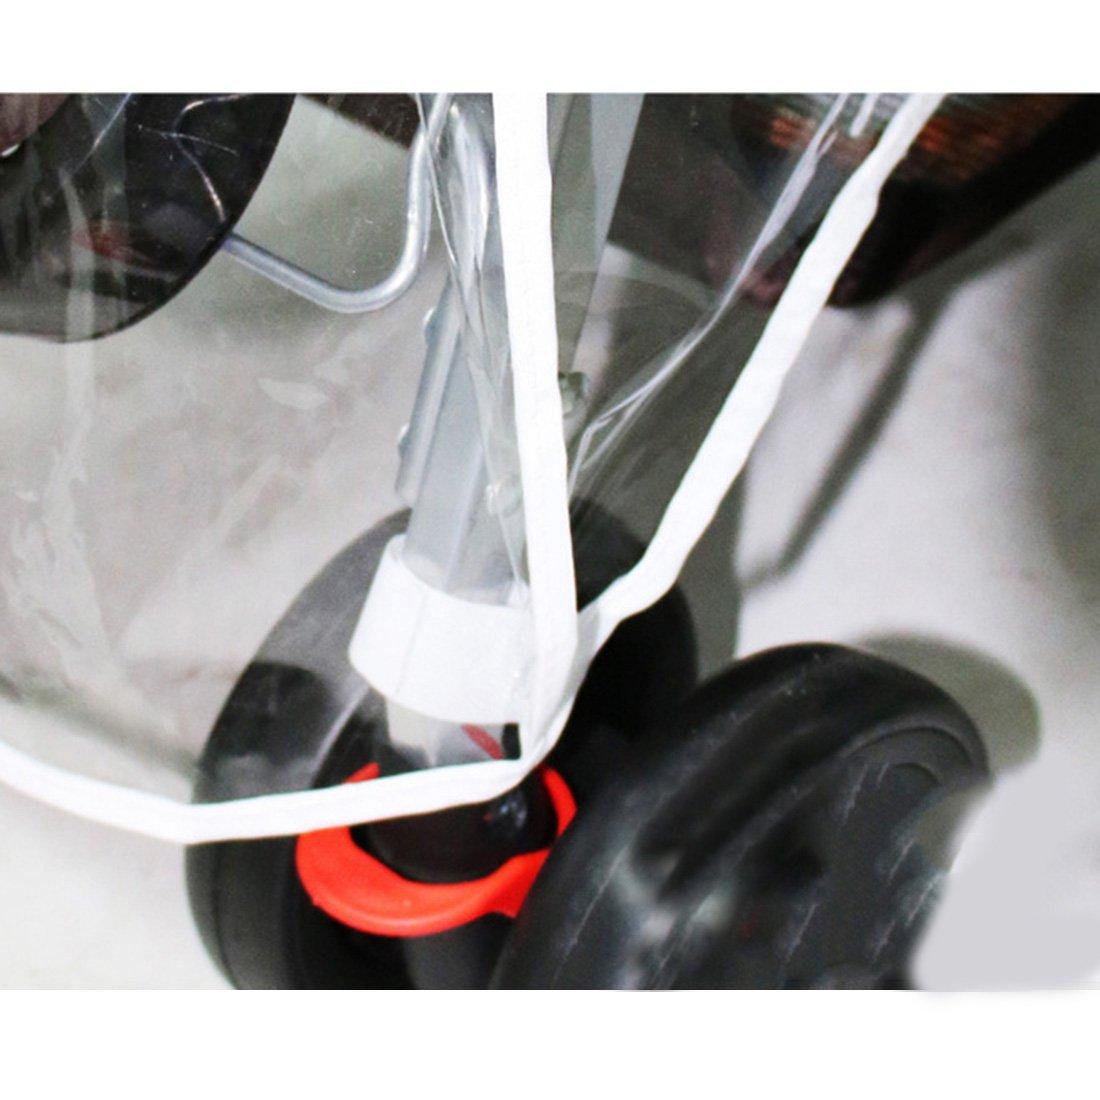 Jinshou Universal Waterproof Twins Baby stroller Rain Cover Side by side Windproof Protection